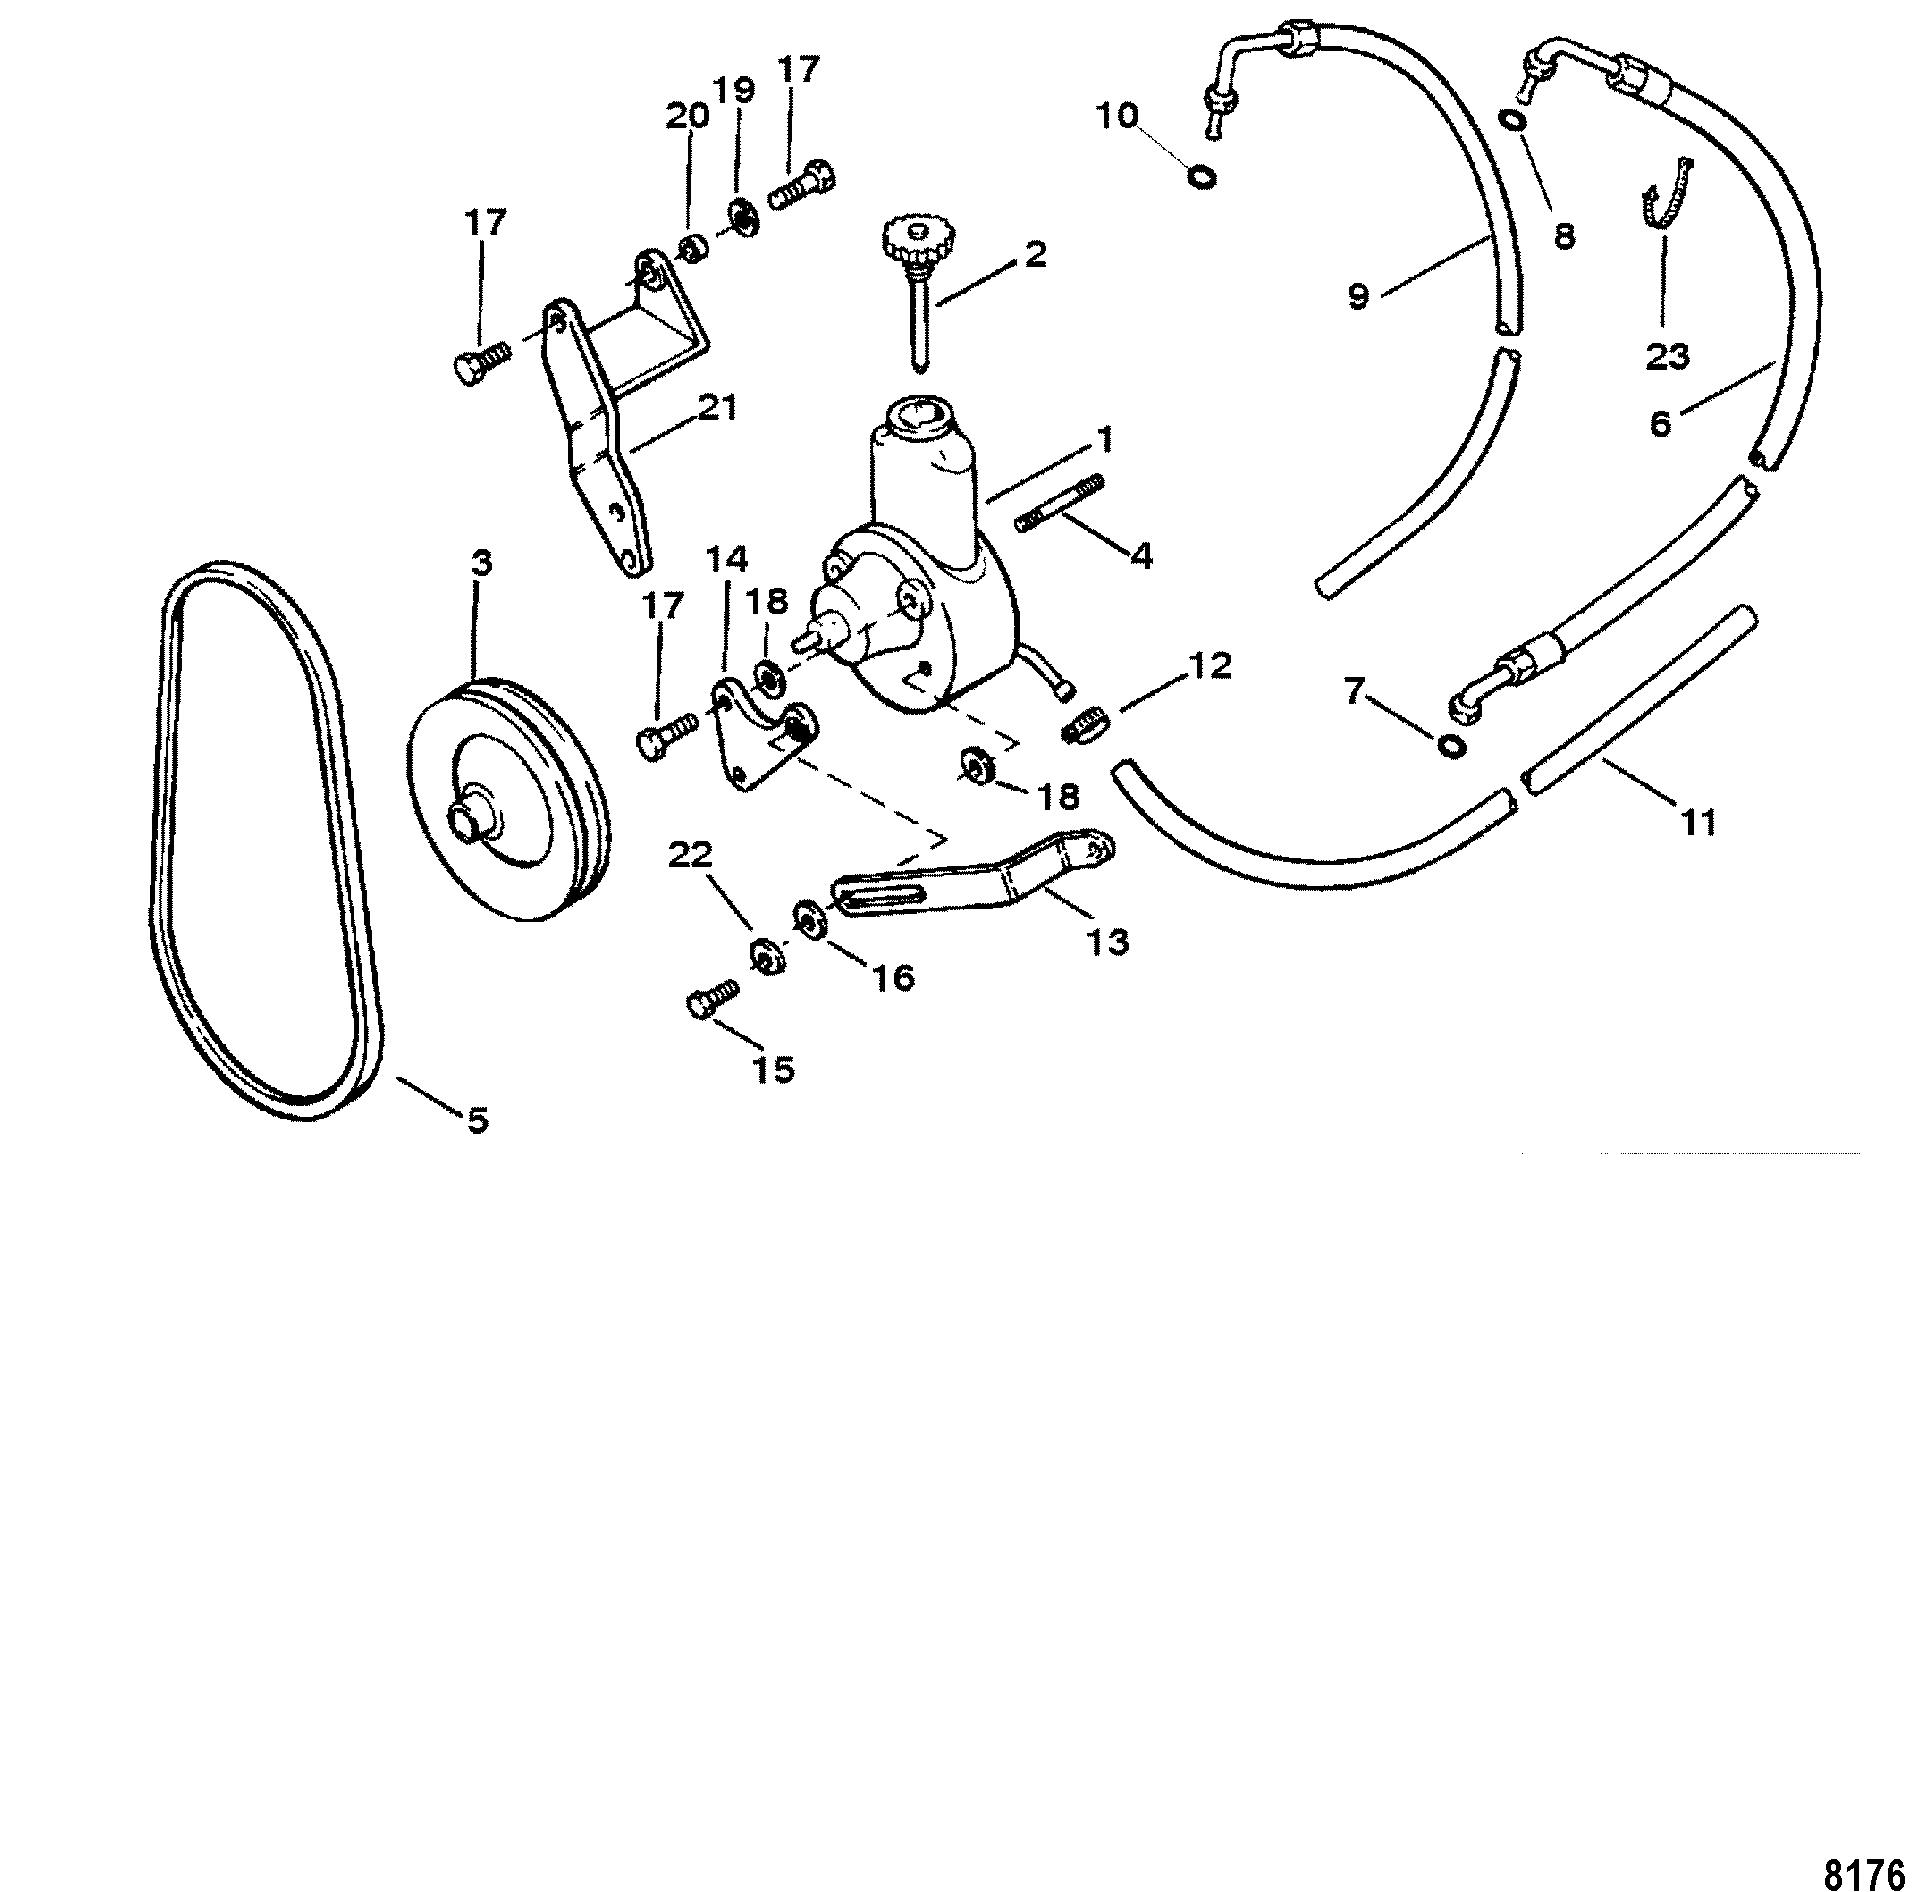 hight resolution of mercury mercruiser 3 0l gm 181 i l4 1 1998 0l010042 thru 0l096999 power steering pump assembly